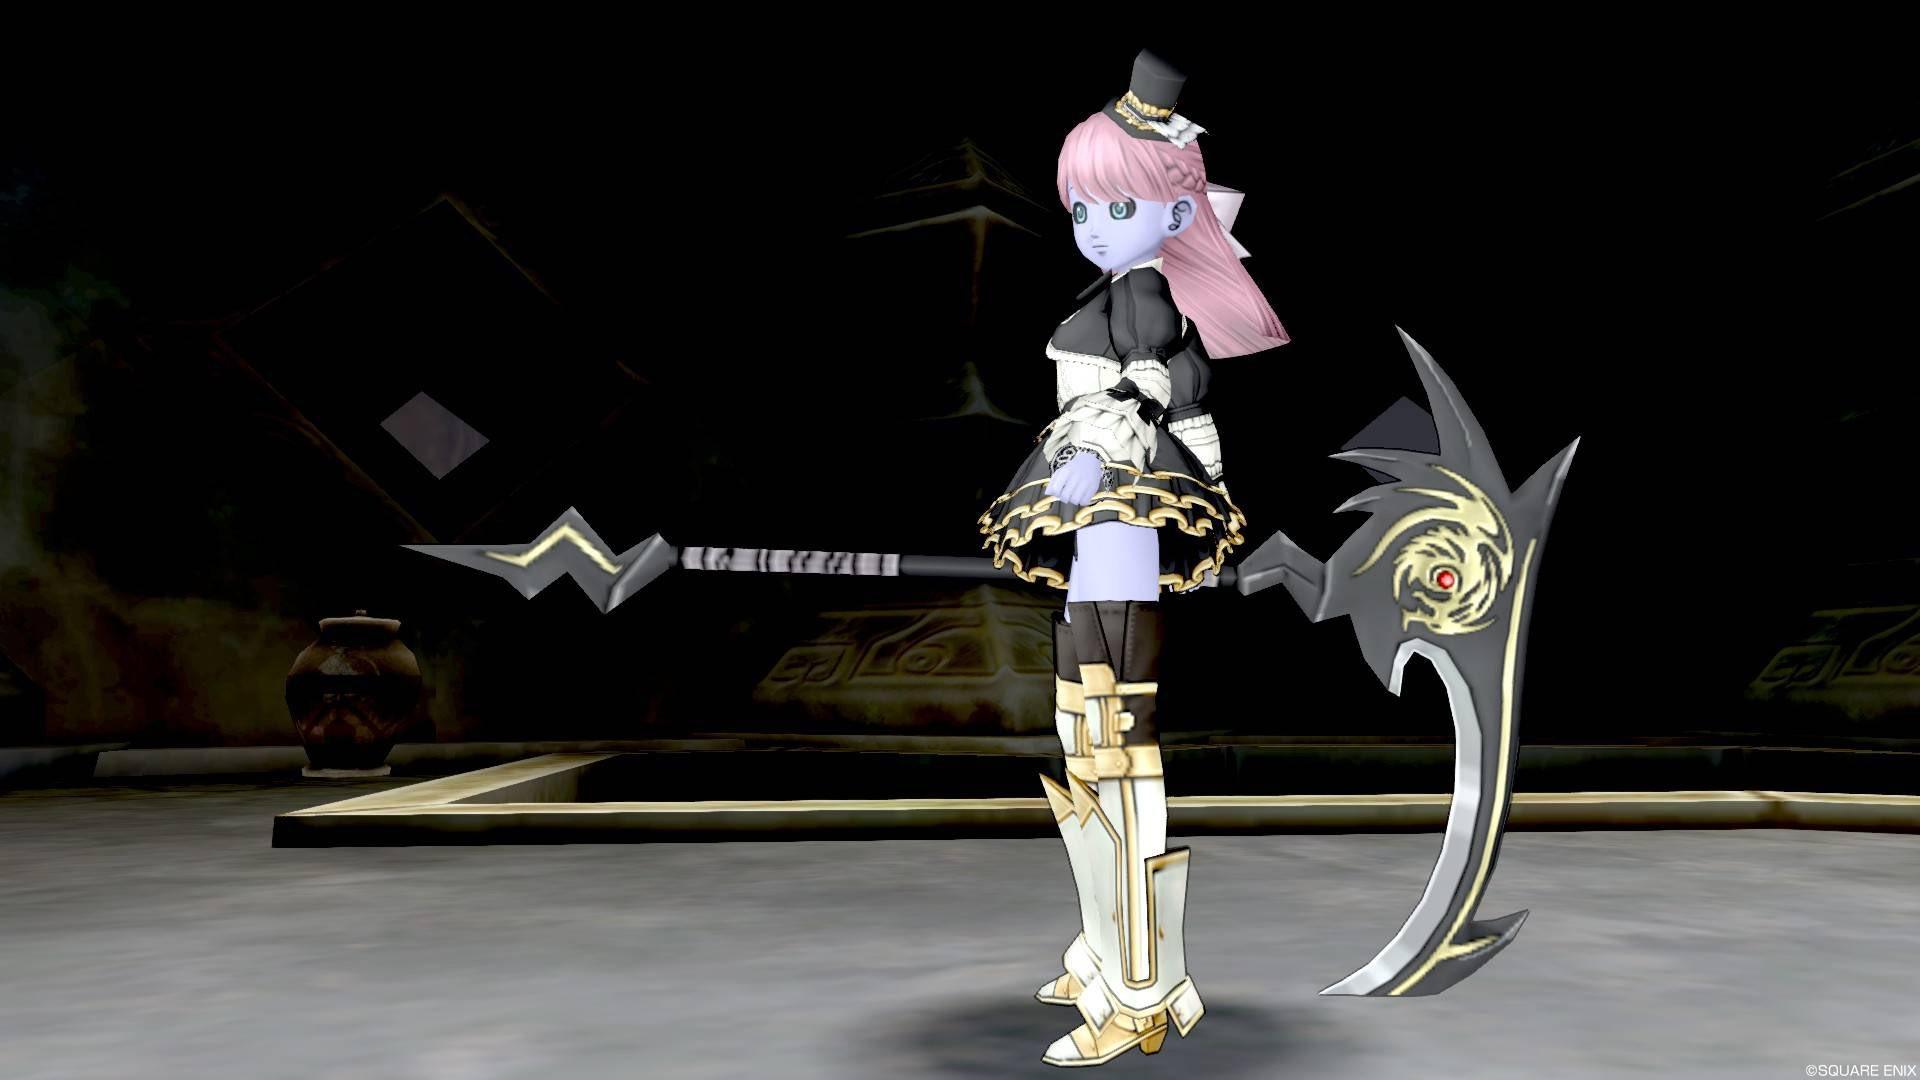 【装備】武器 > 鎌「常闇の鎌」